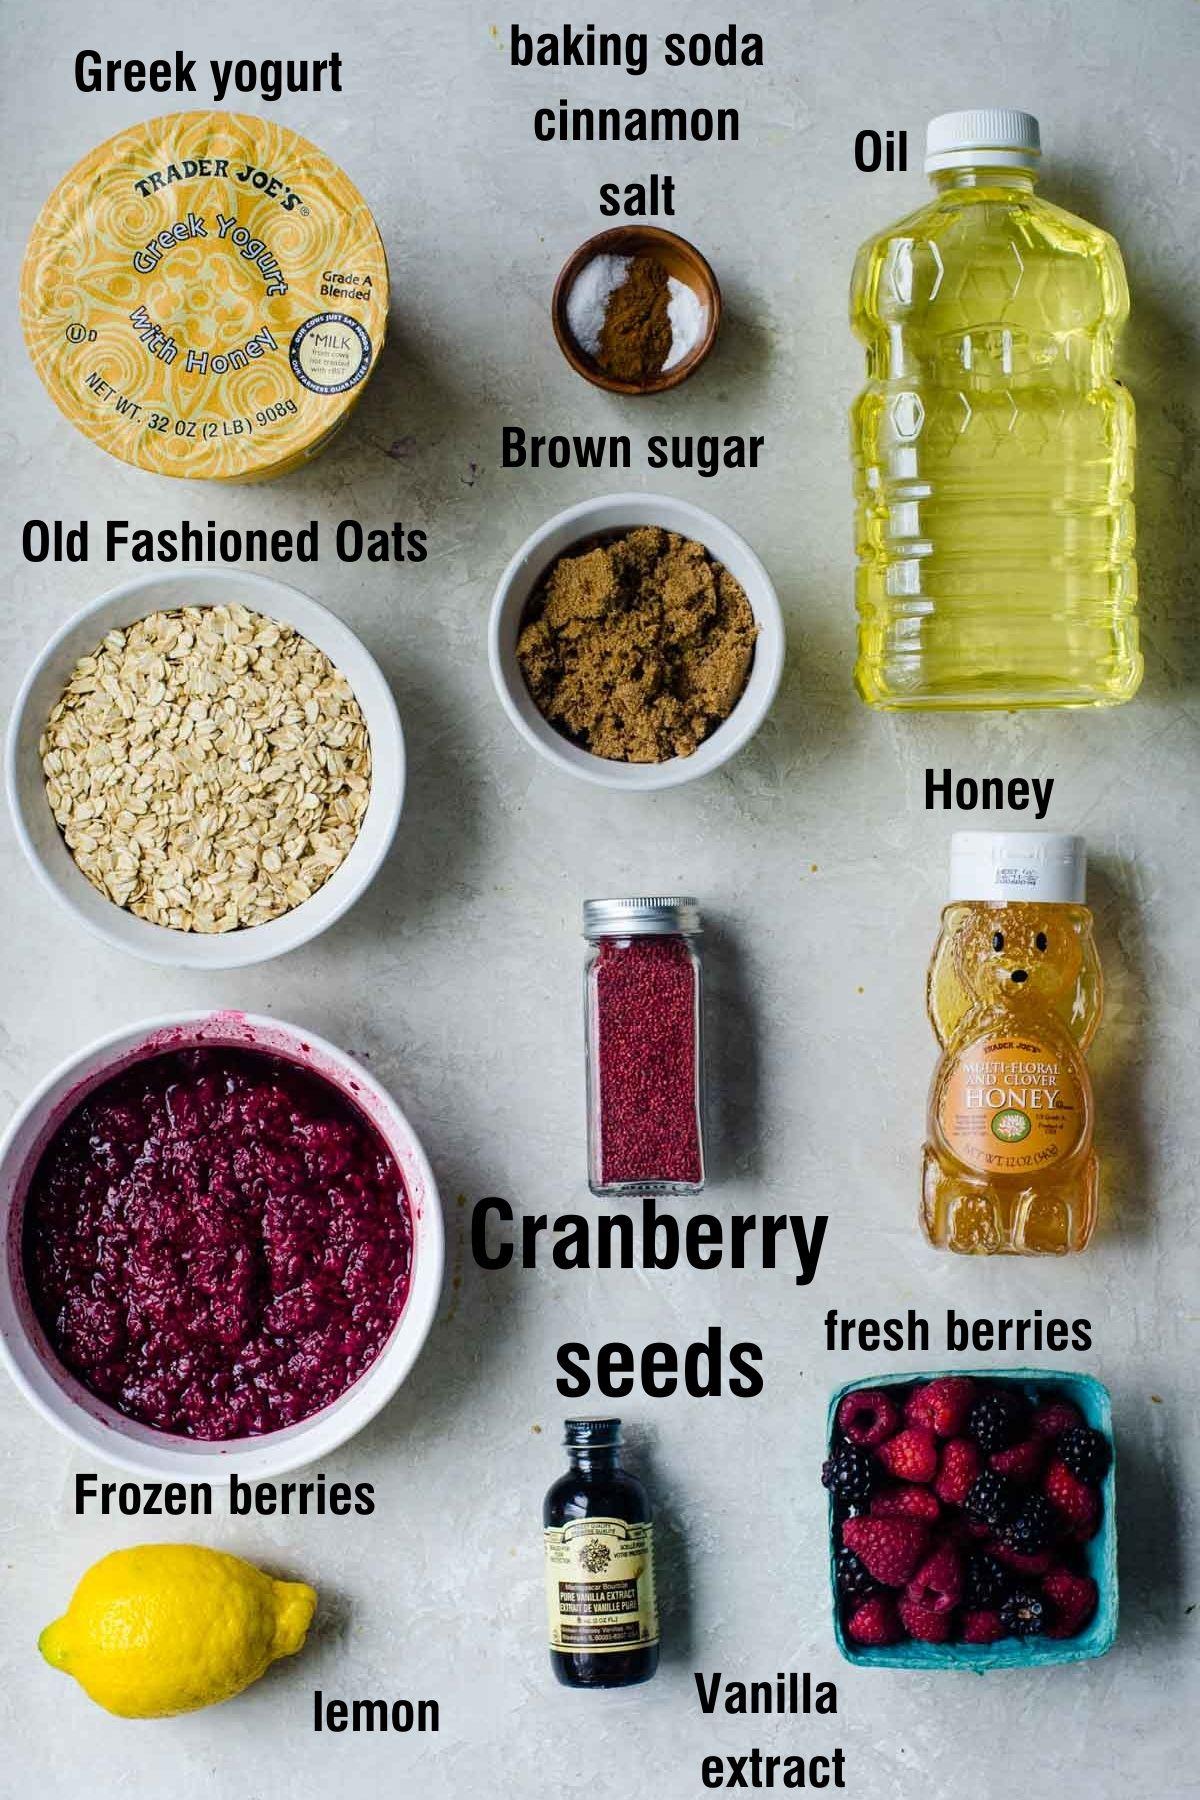 Labeled Ingredients for making frozen yogurt bars.